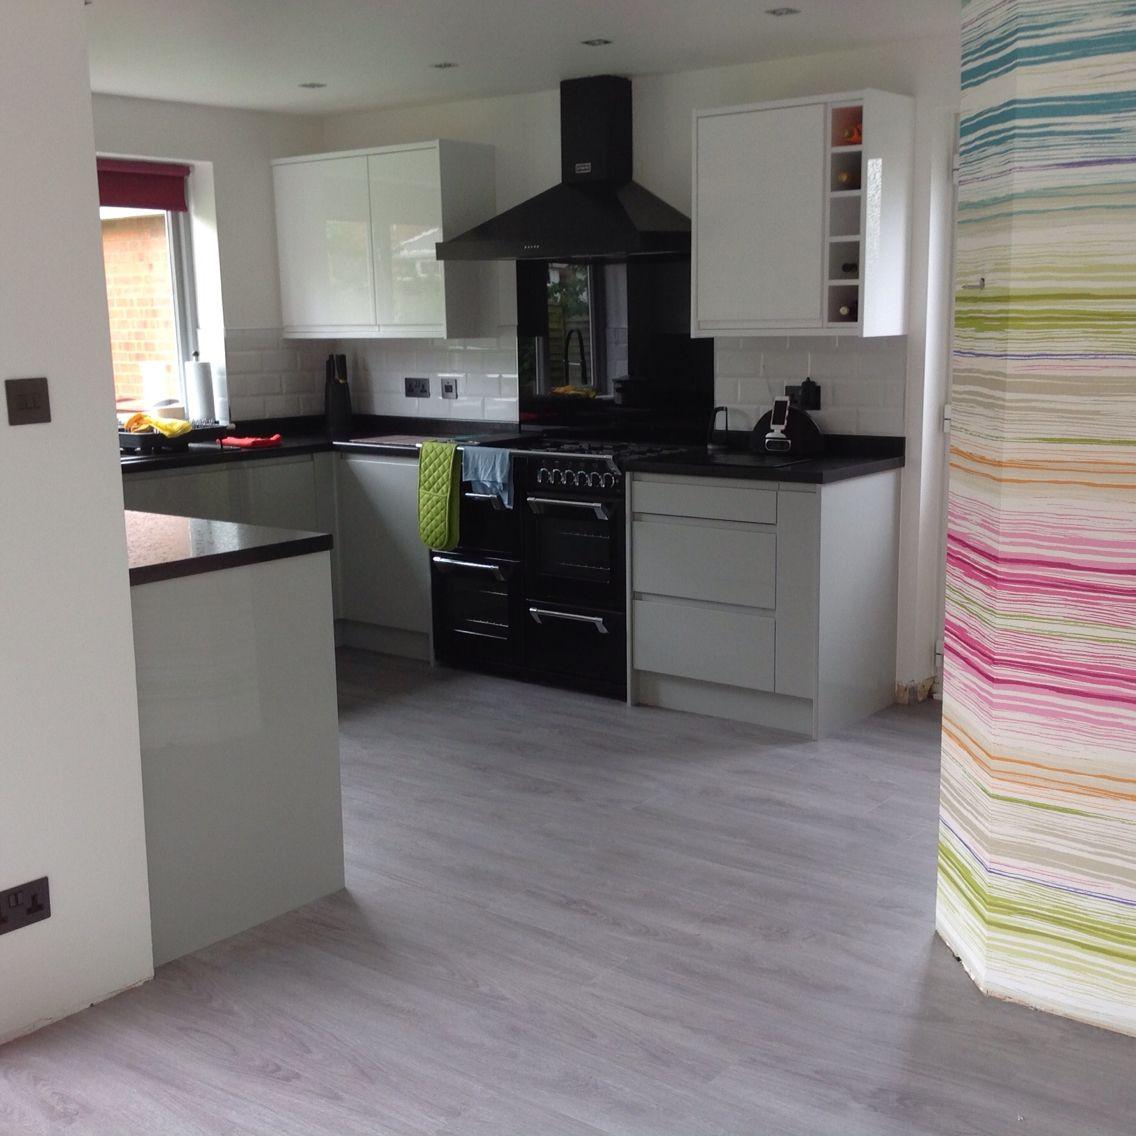 Kitchen floor finally done moduleo classic oak love the